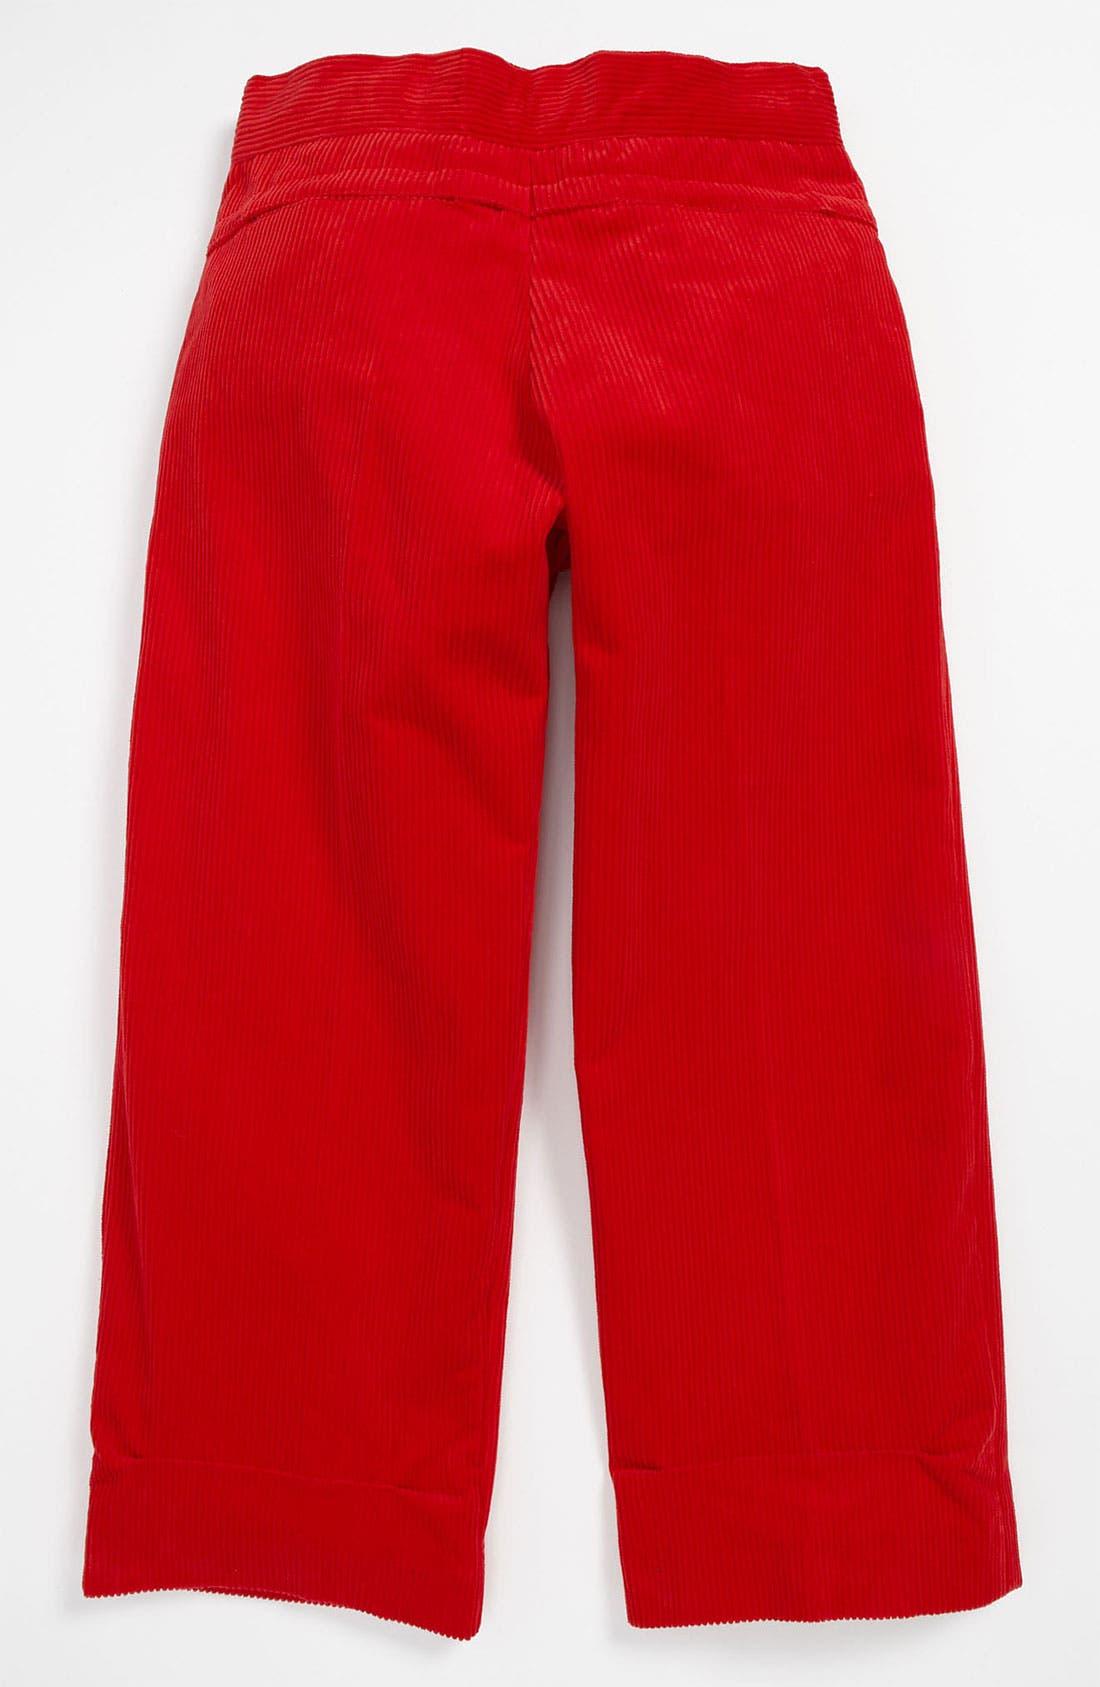 Main Image - Marni Corduroy Pants (Little Girls & Big Girls)